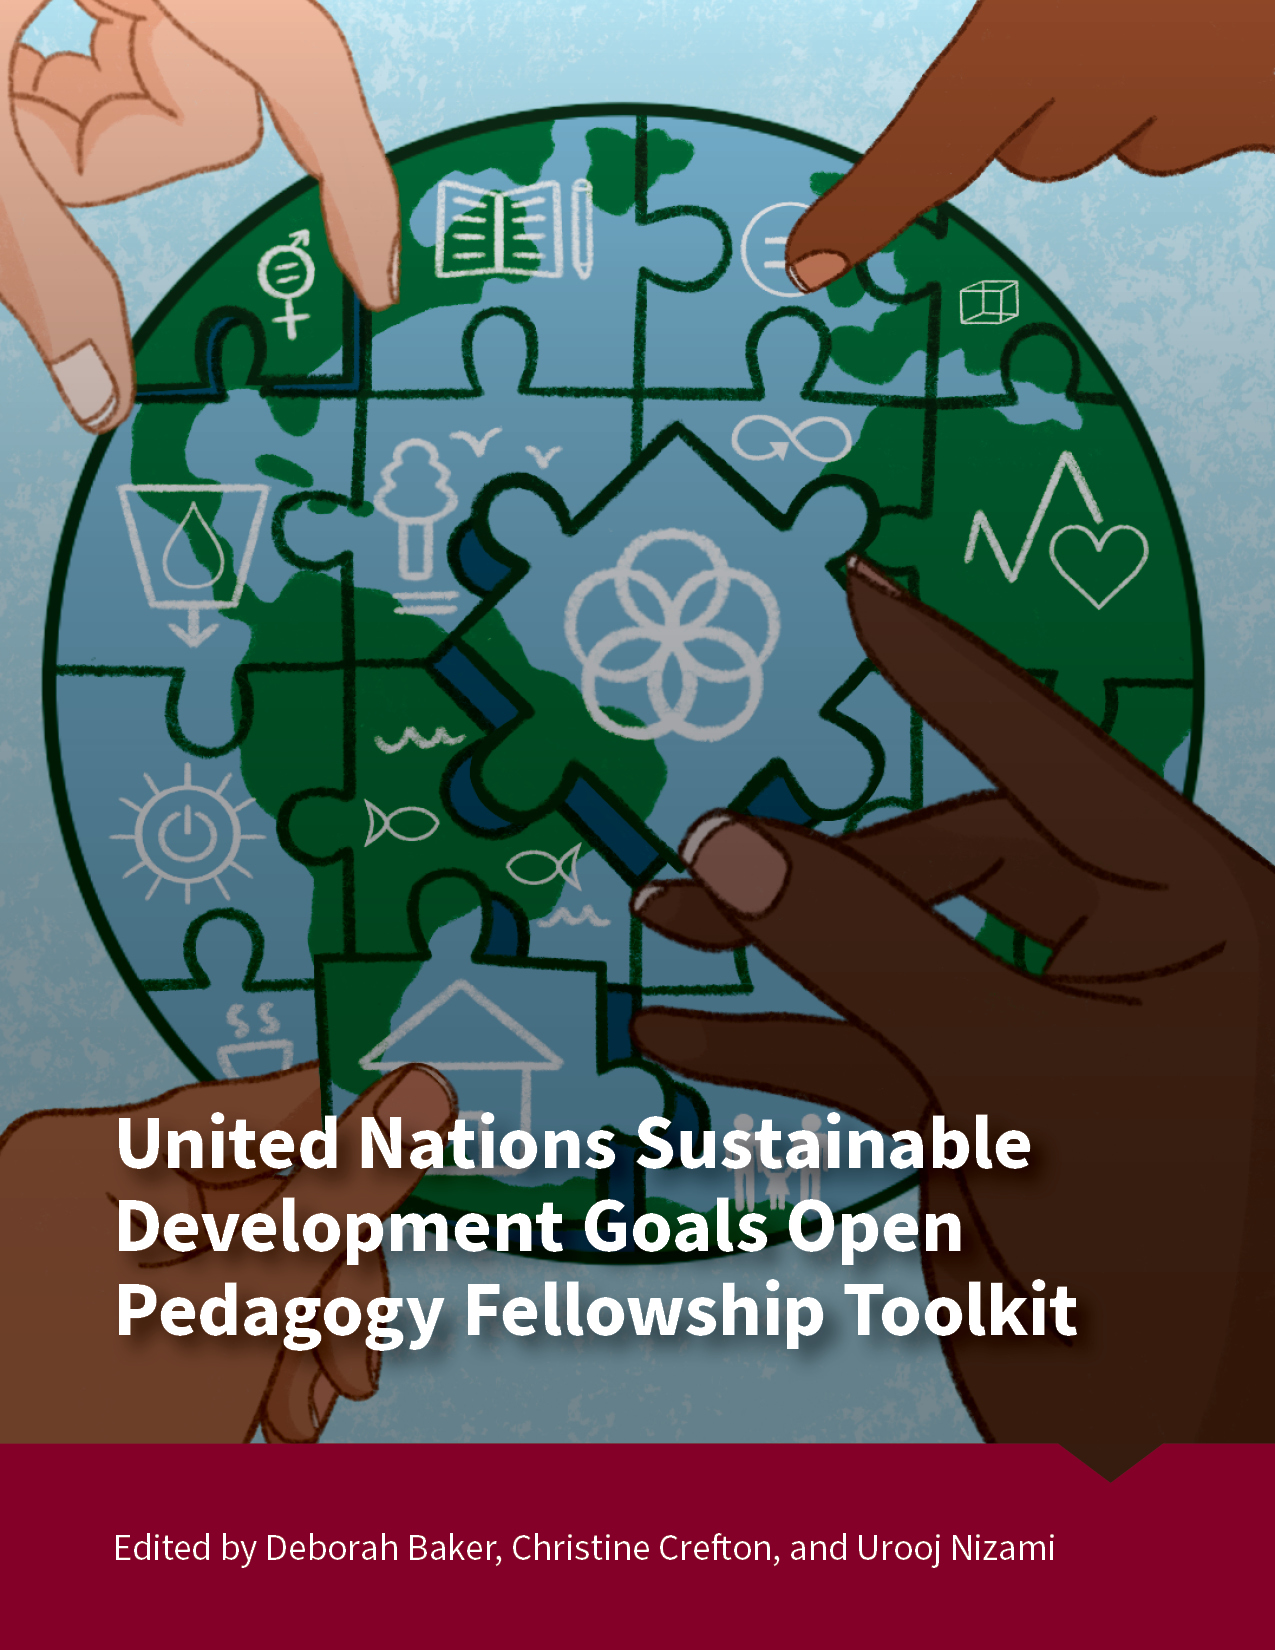 Cover image for UN Sustainable Development Goals Open Pedagogy Fellowship